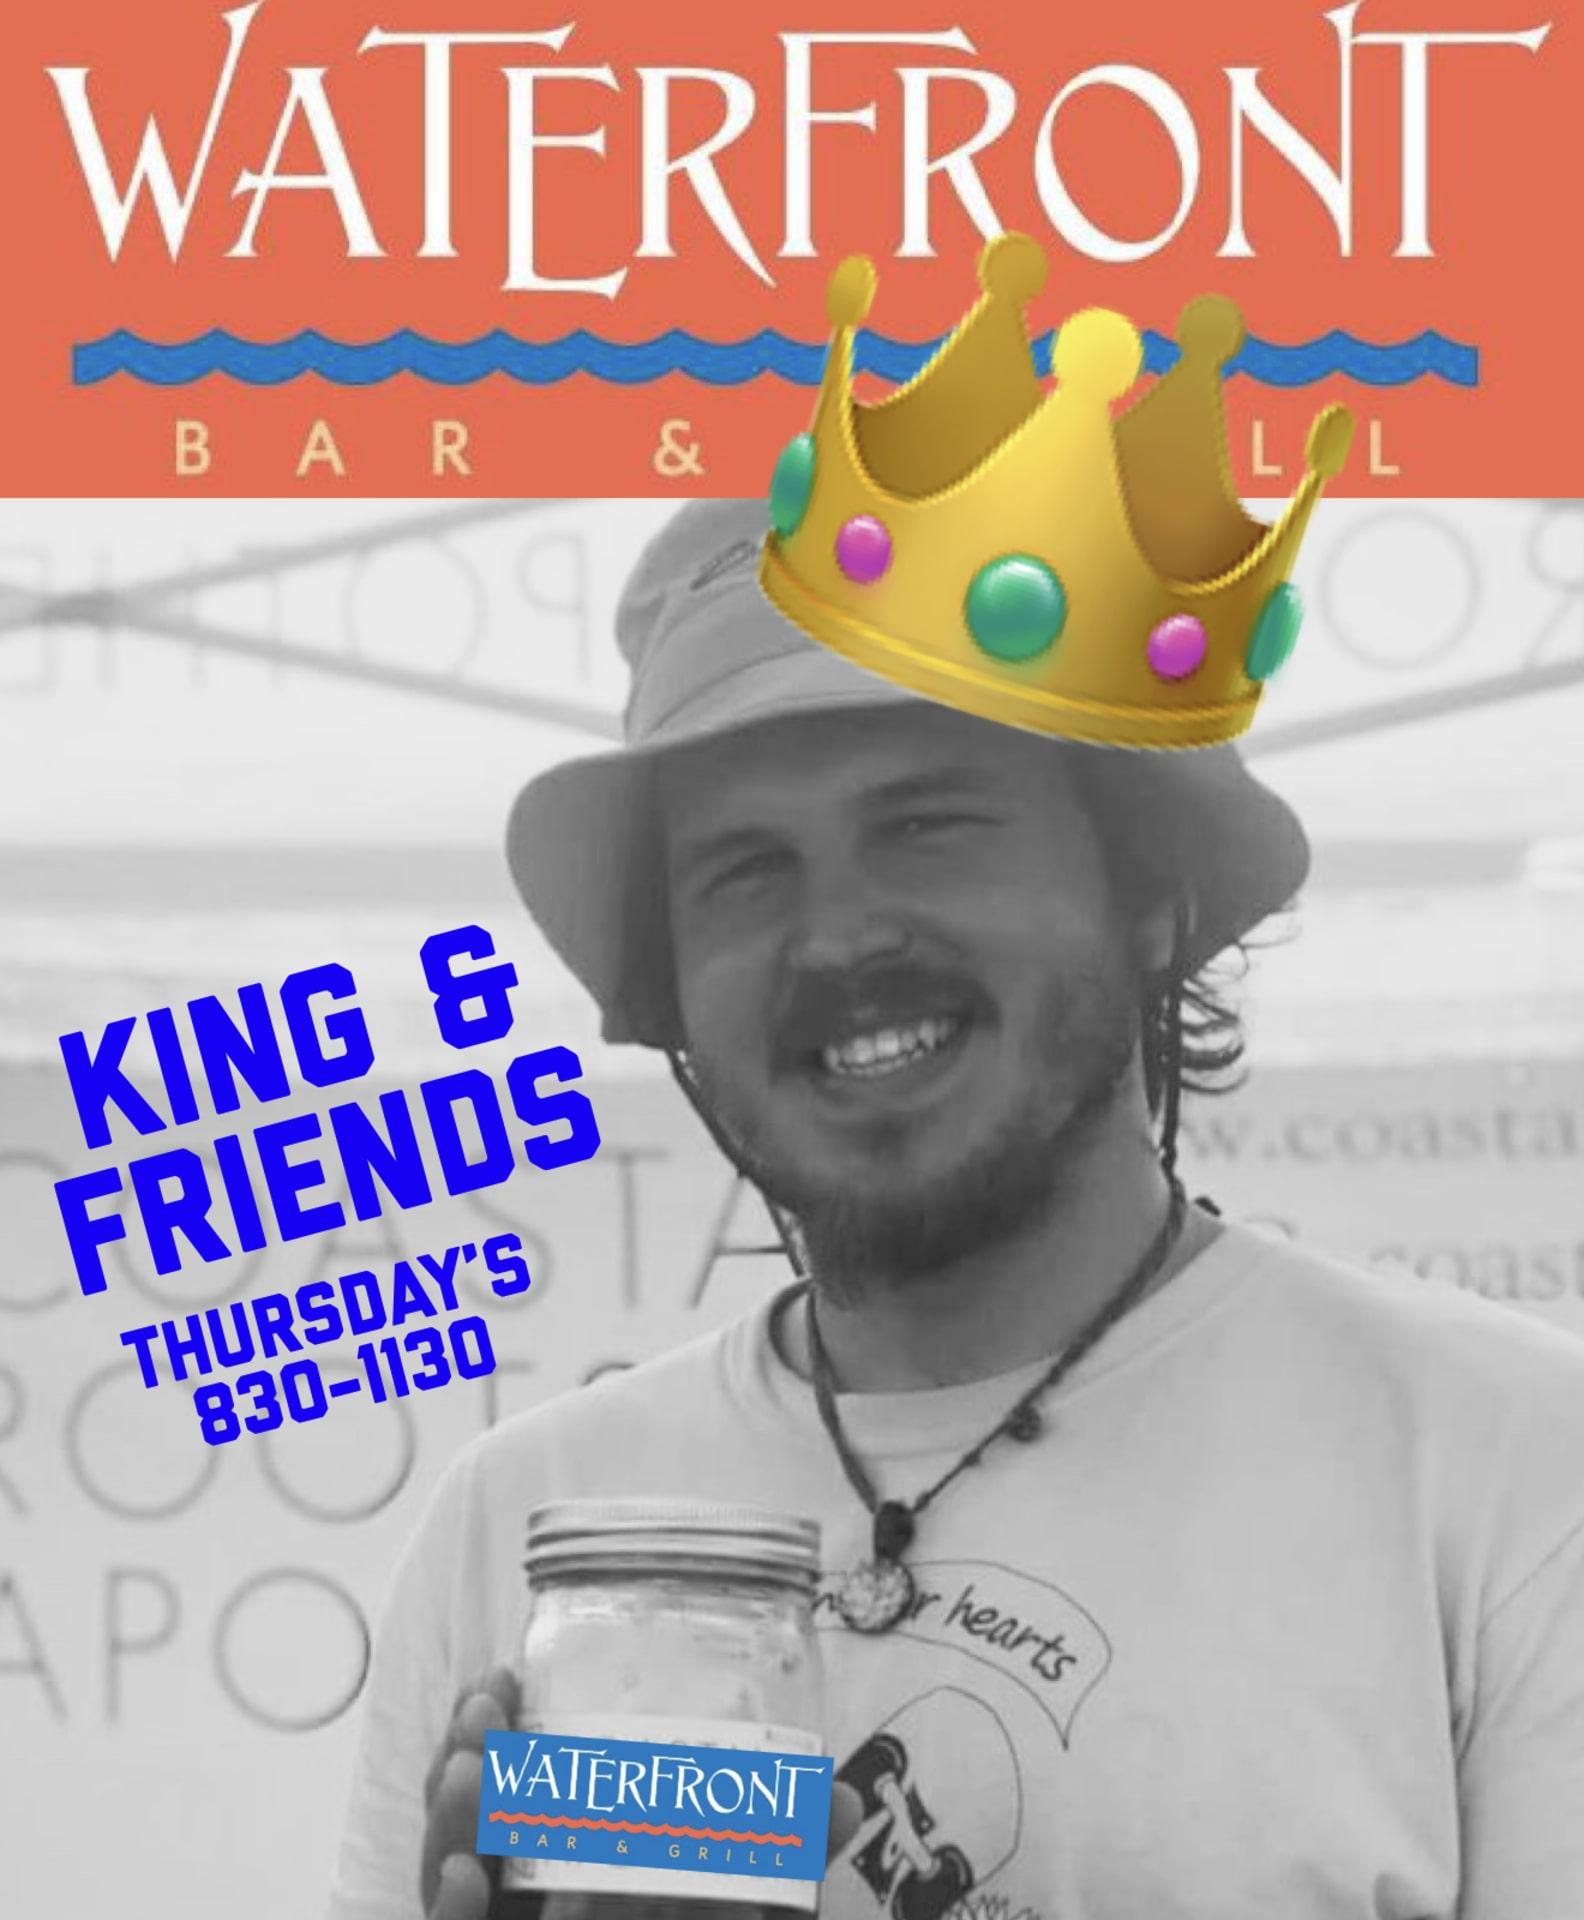 Thursdays: King & Friends